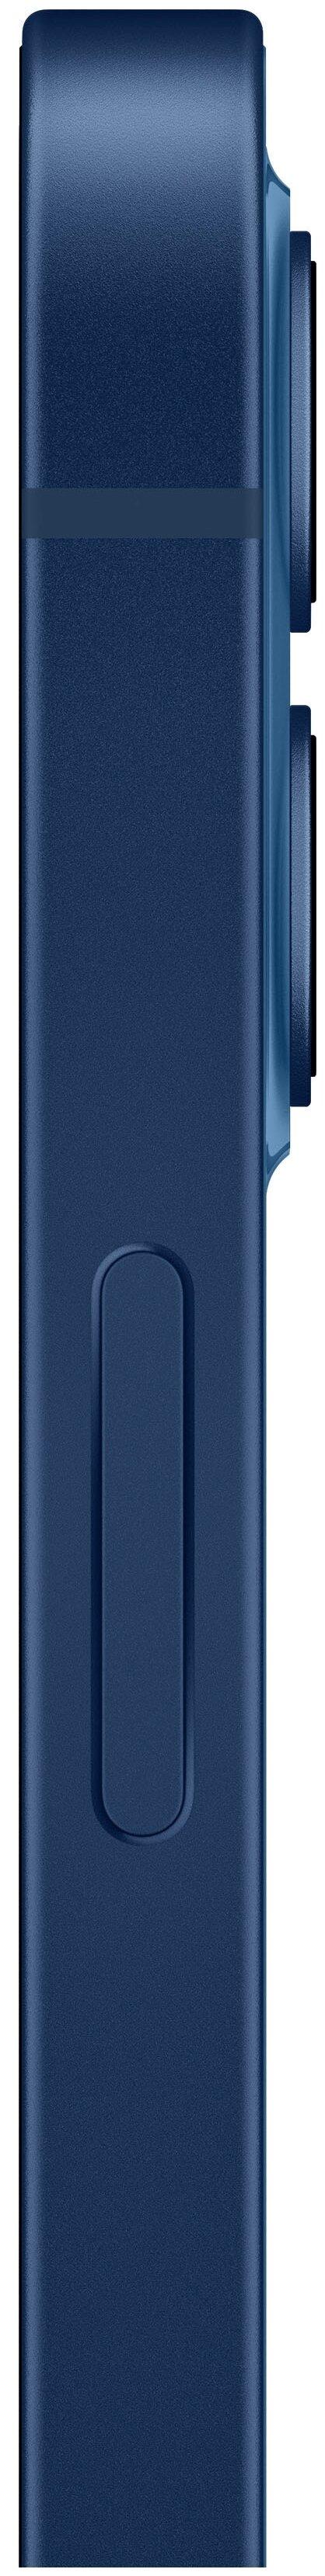 Apple iPhone 12 128GB - аккумулятор: 2815мА·ч